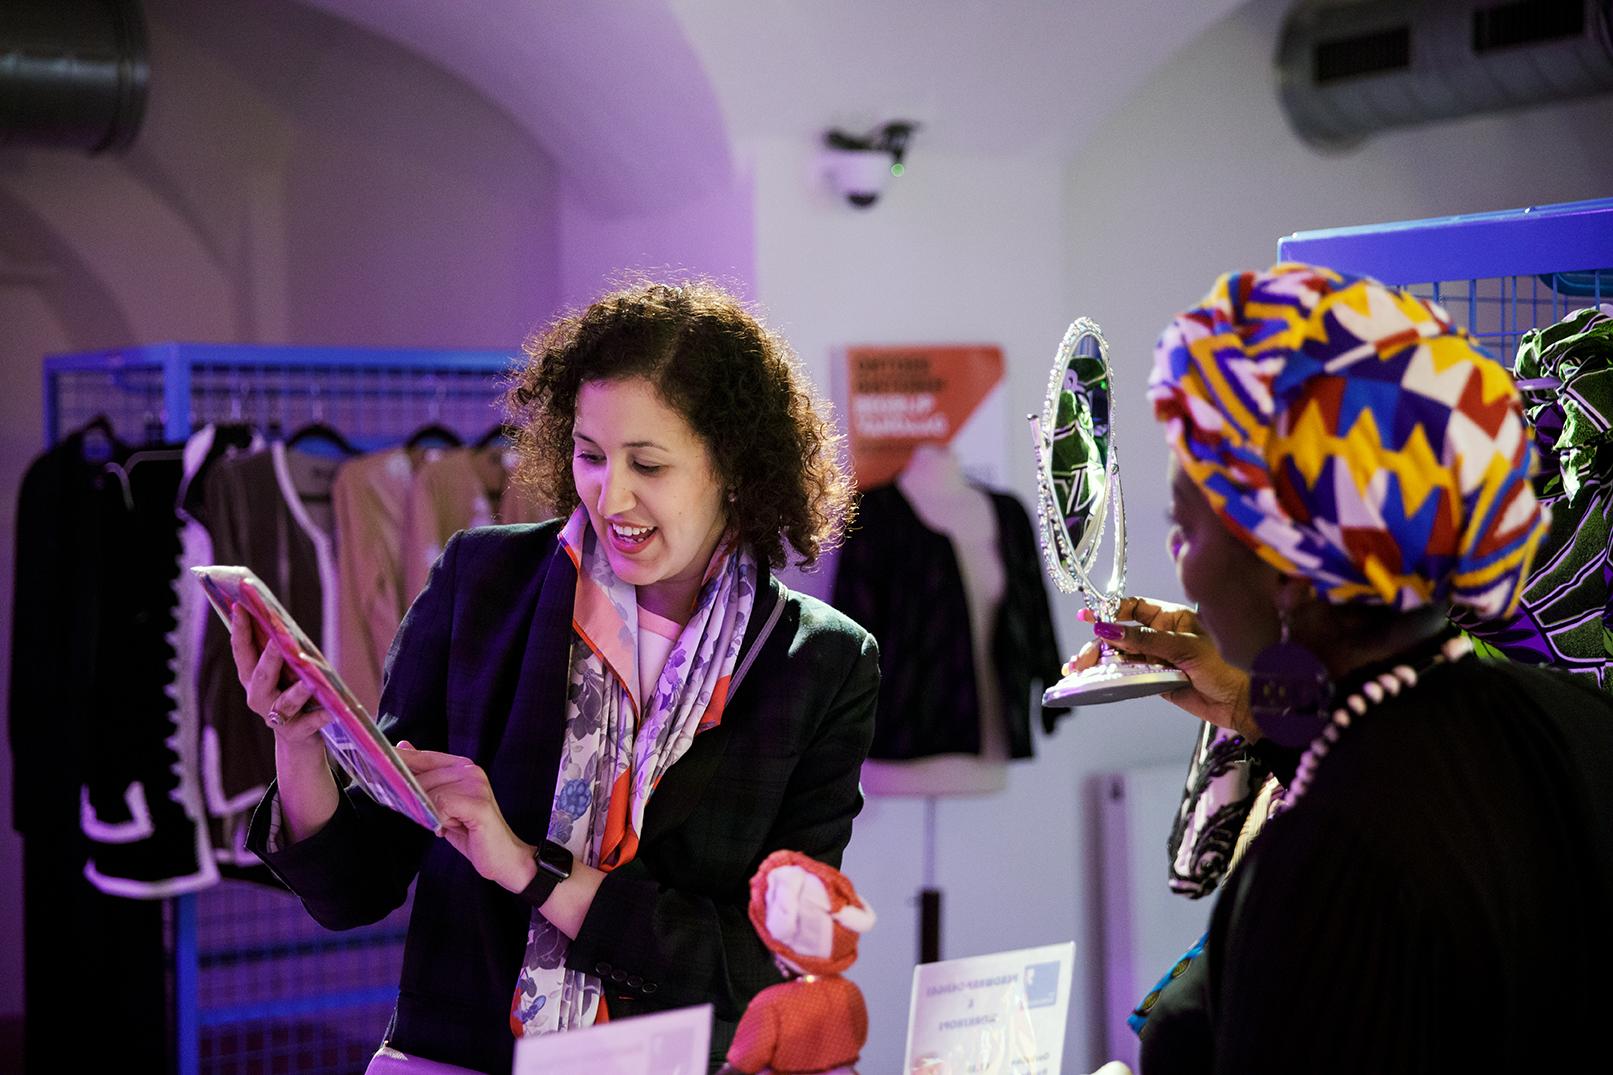 Mode, muziek, ontmoetingen tijdens Modest Fashion Art Fair